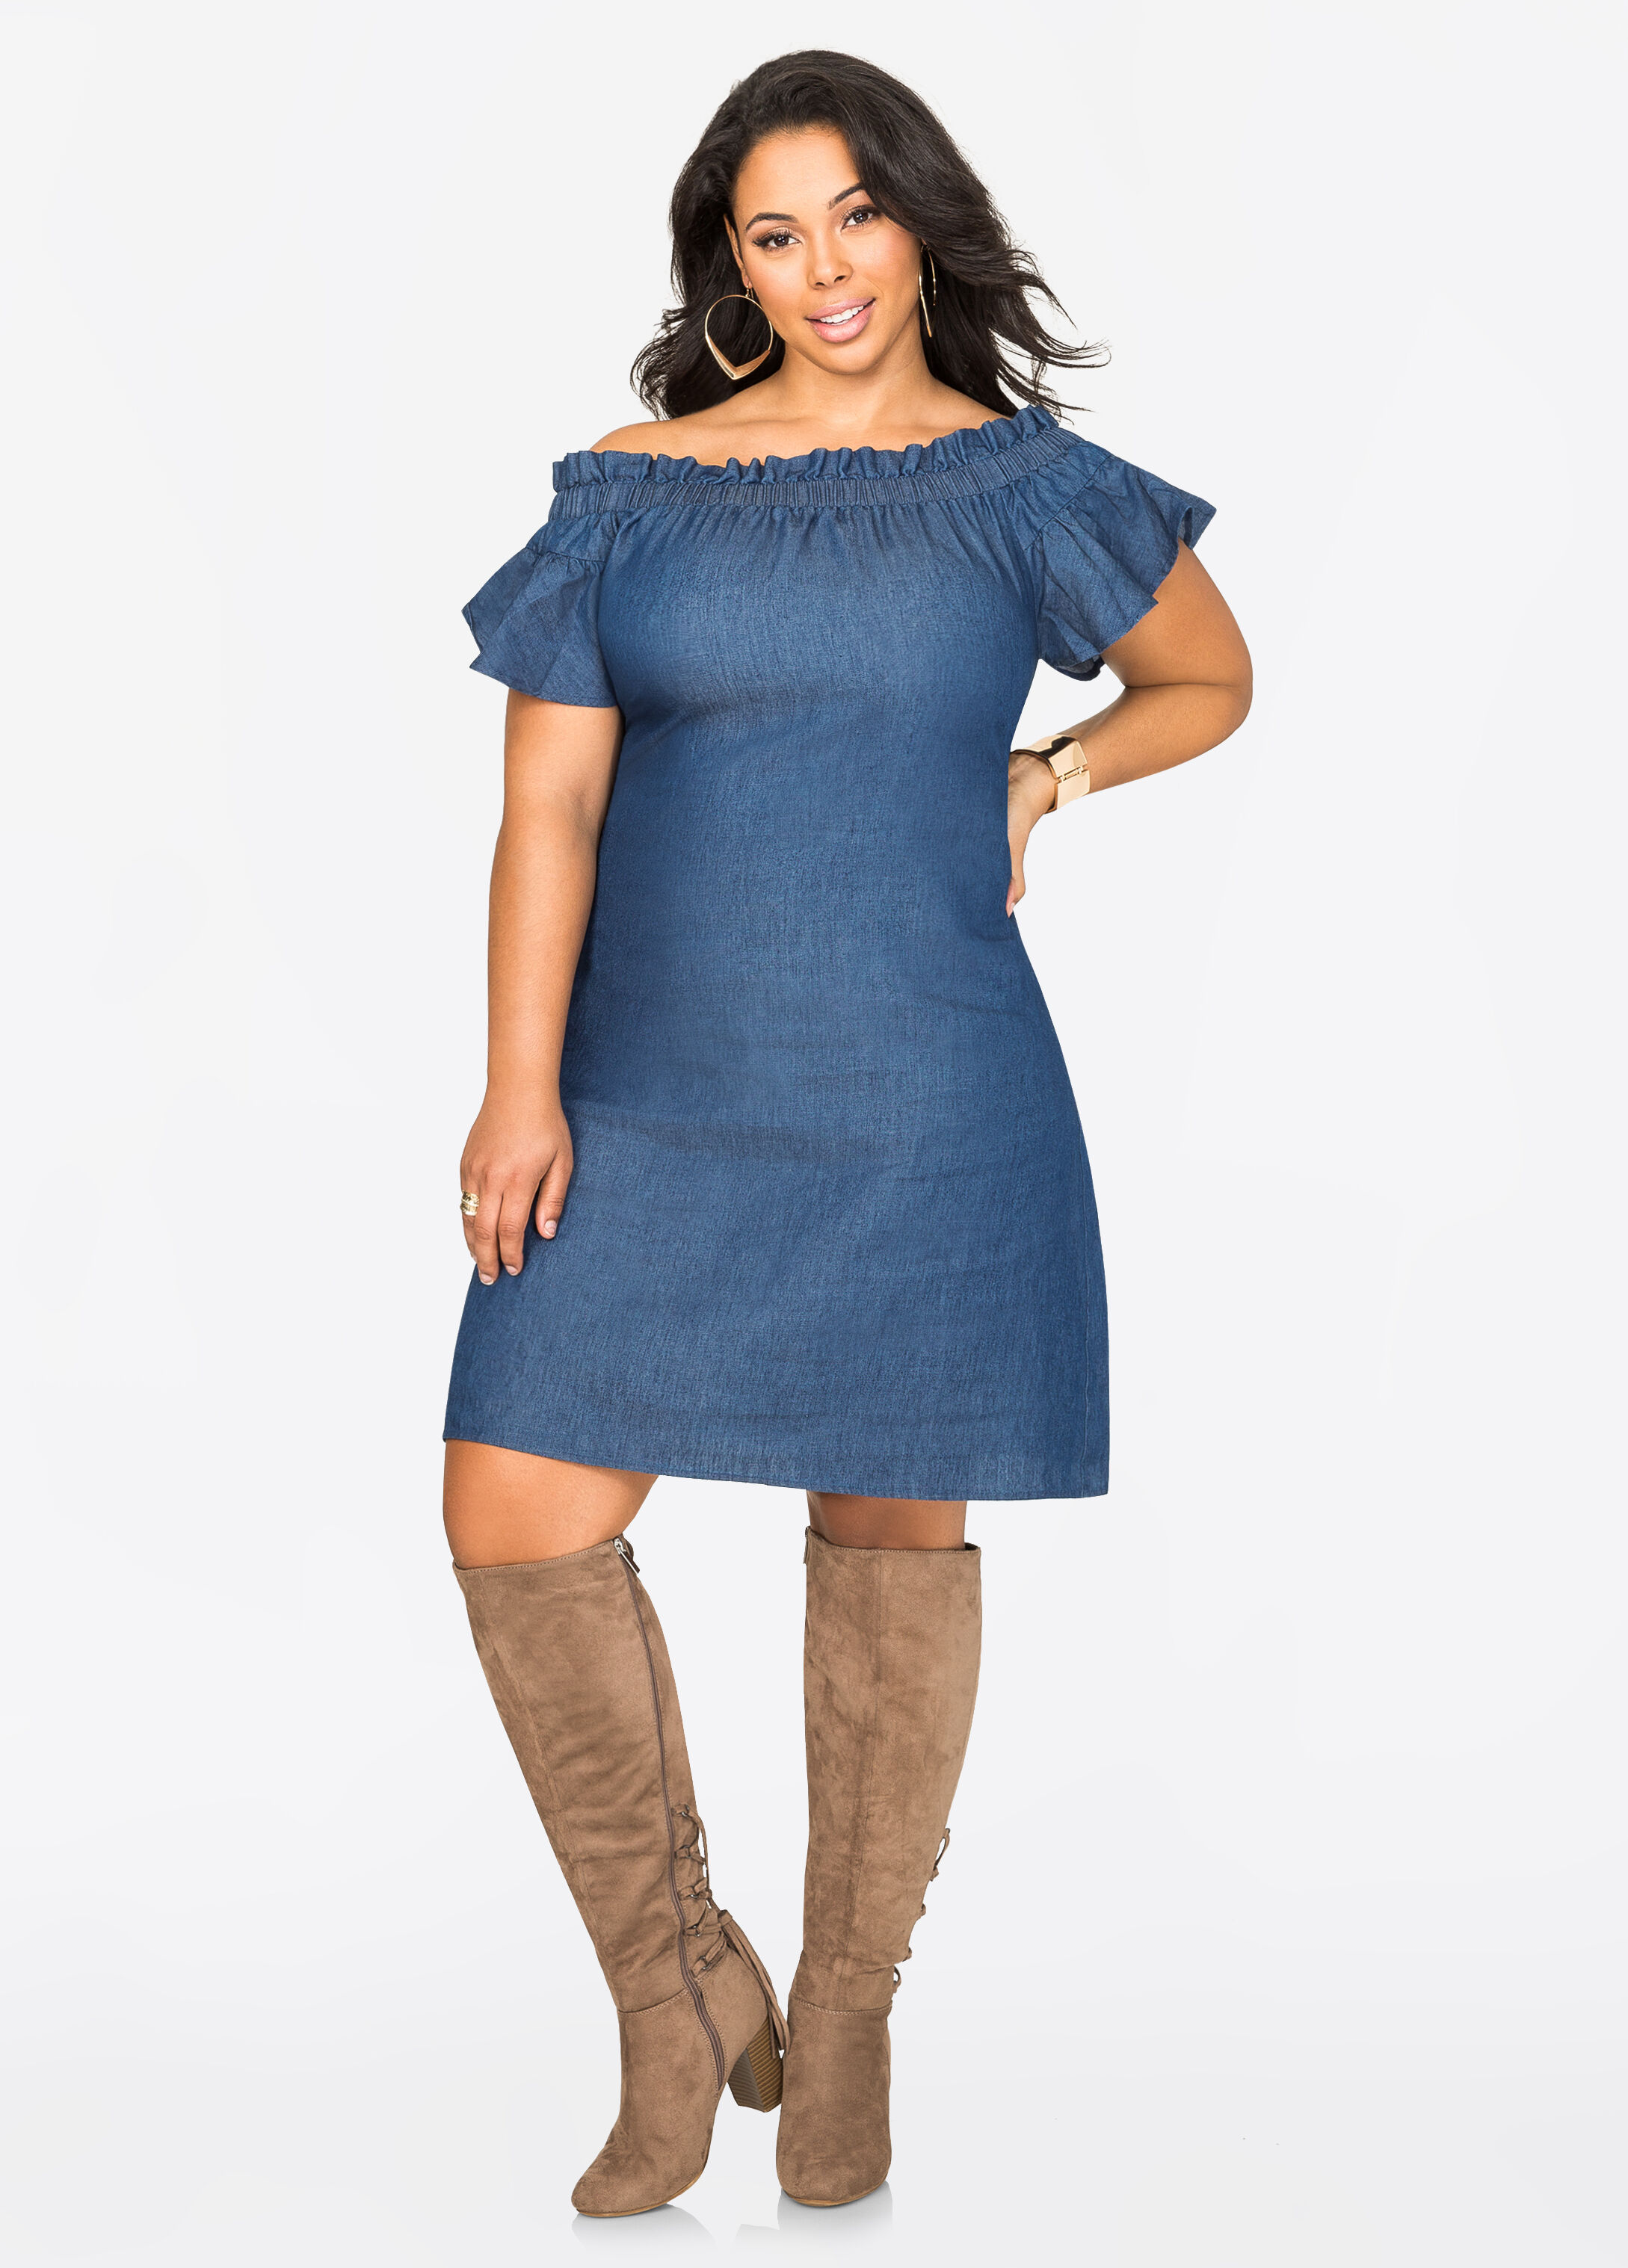 Ruffle Top Off-Shoulder Dress